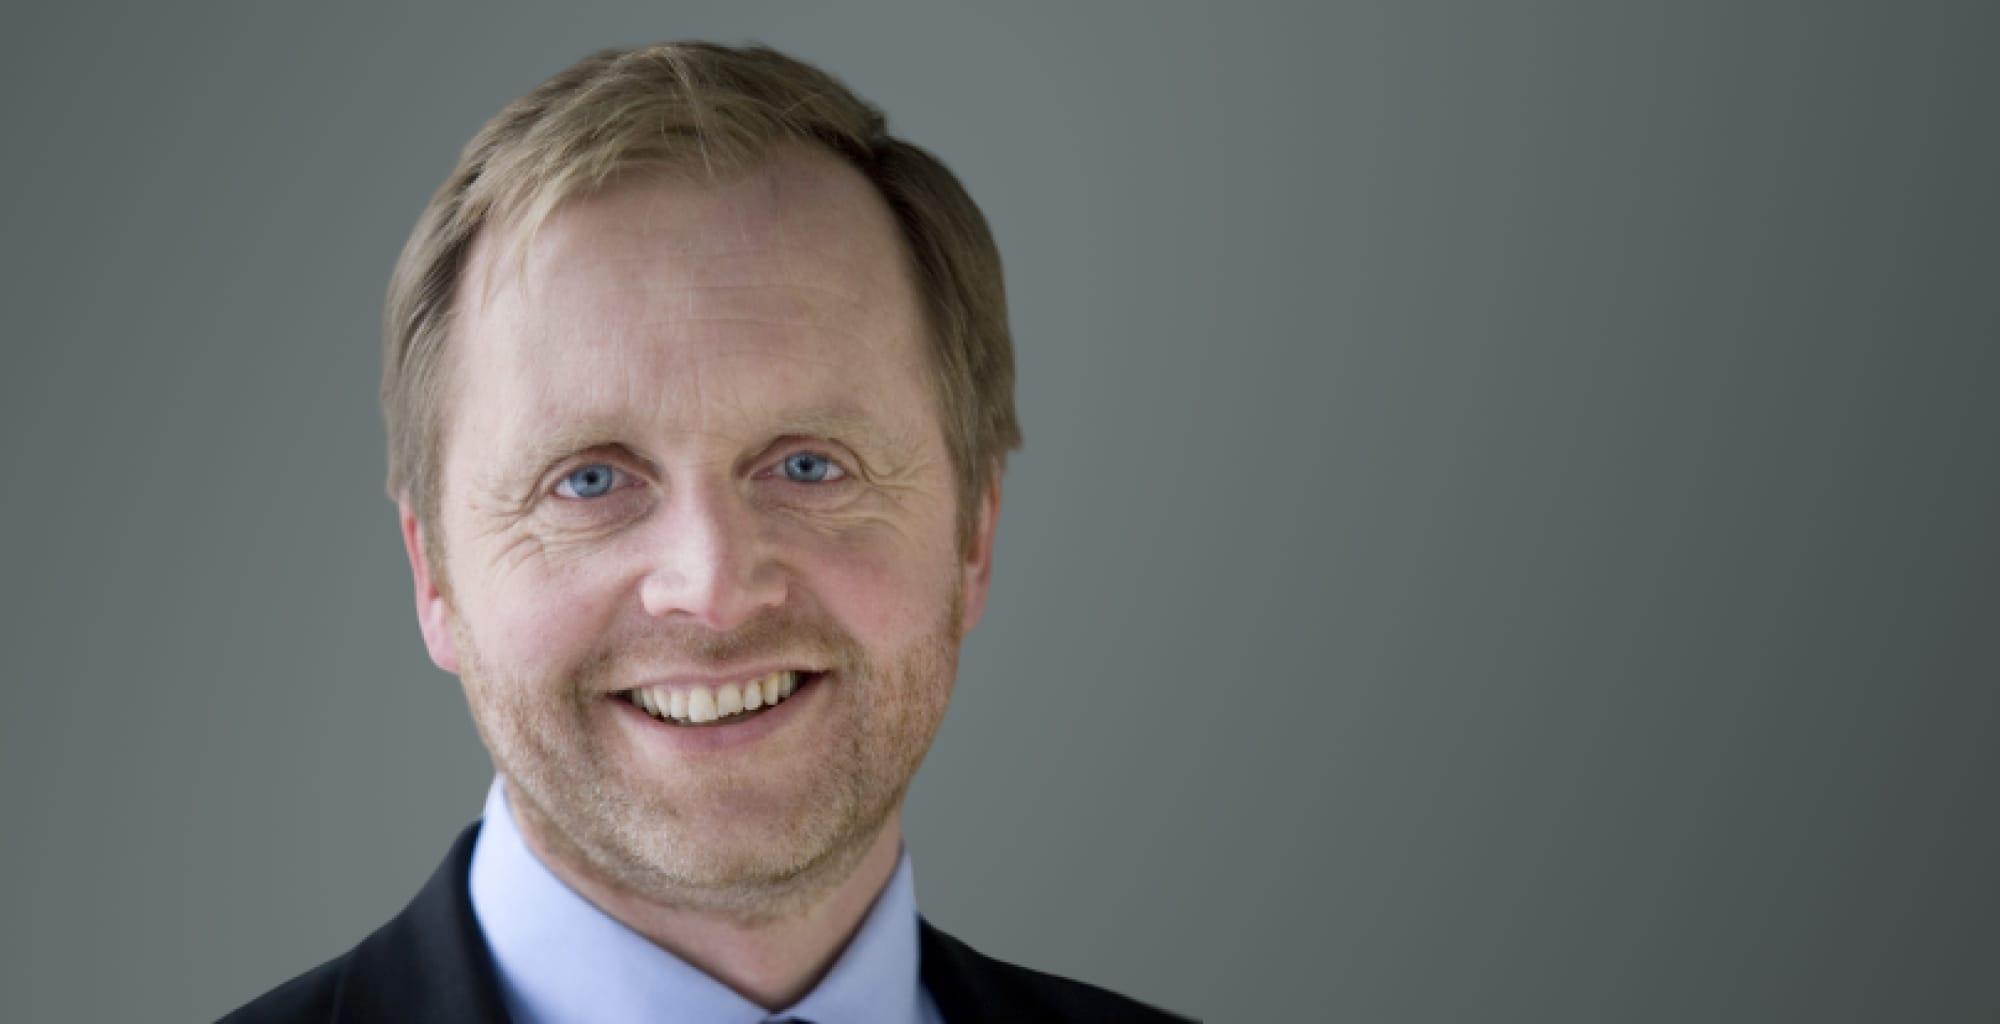 Bjørn K Haugland to the Board of Directors